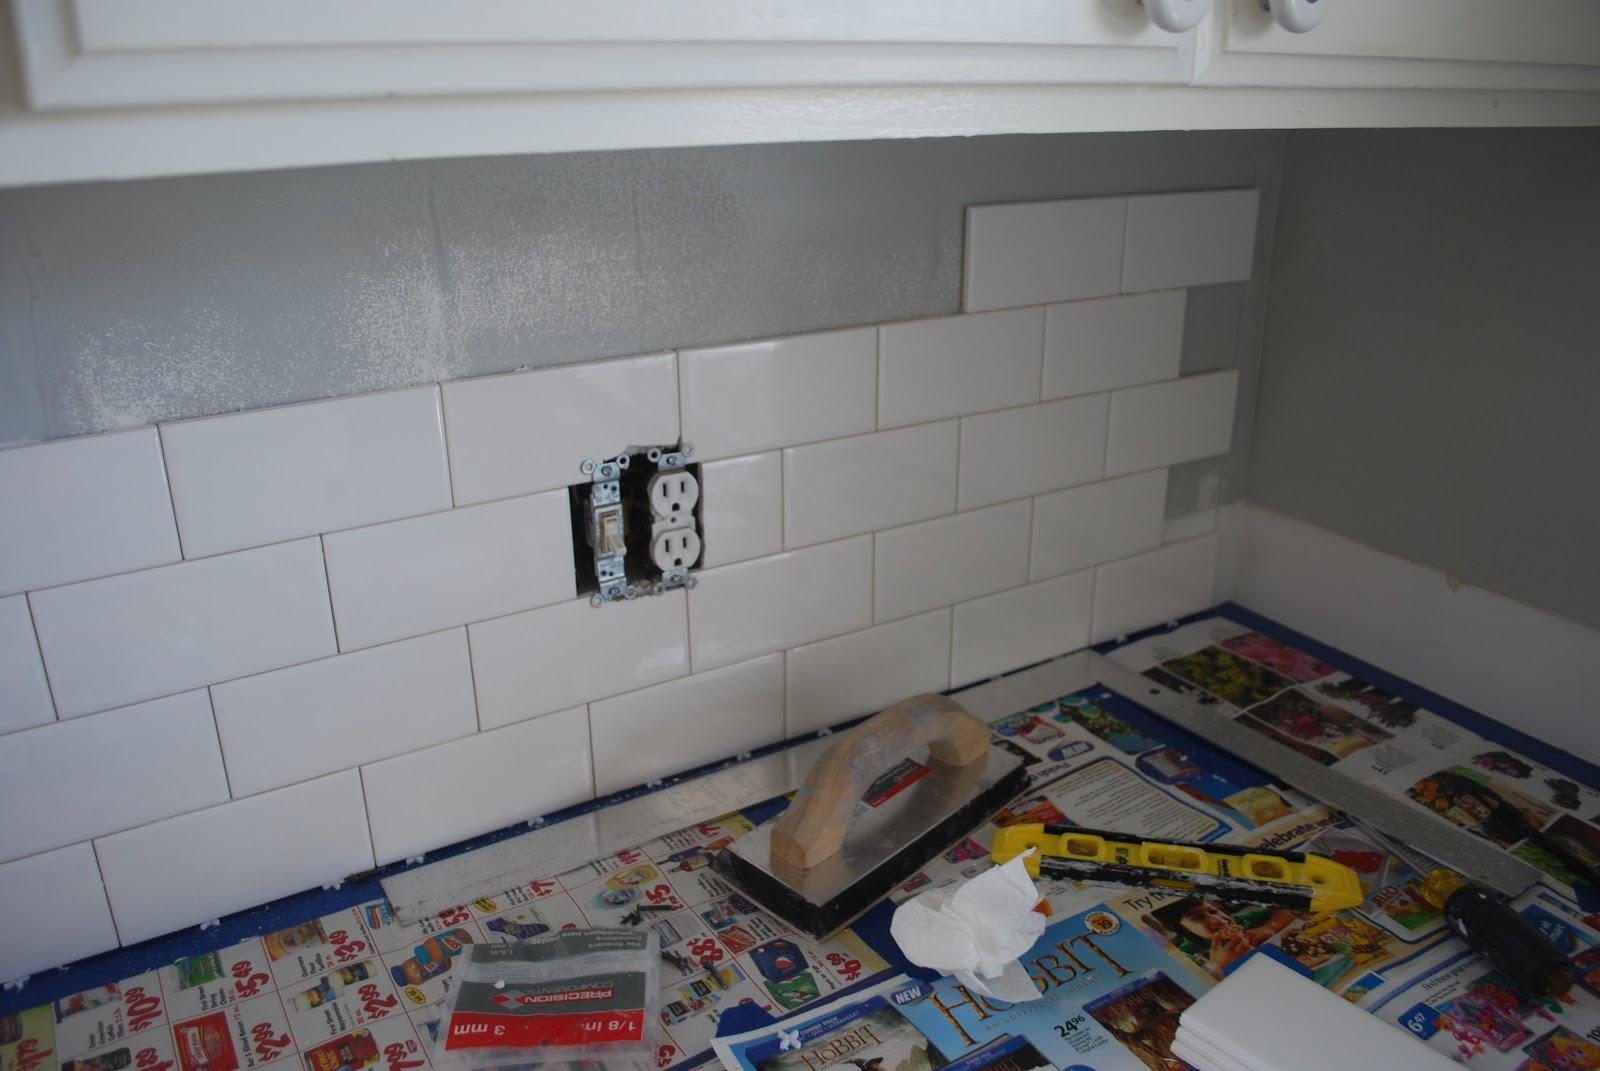 Kraken Crafts: A Little Bit of Subway Tile